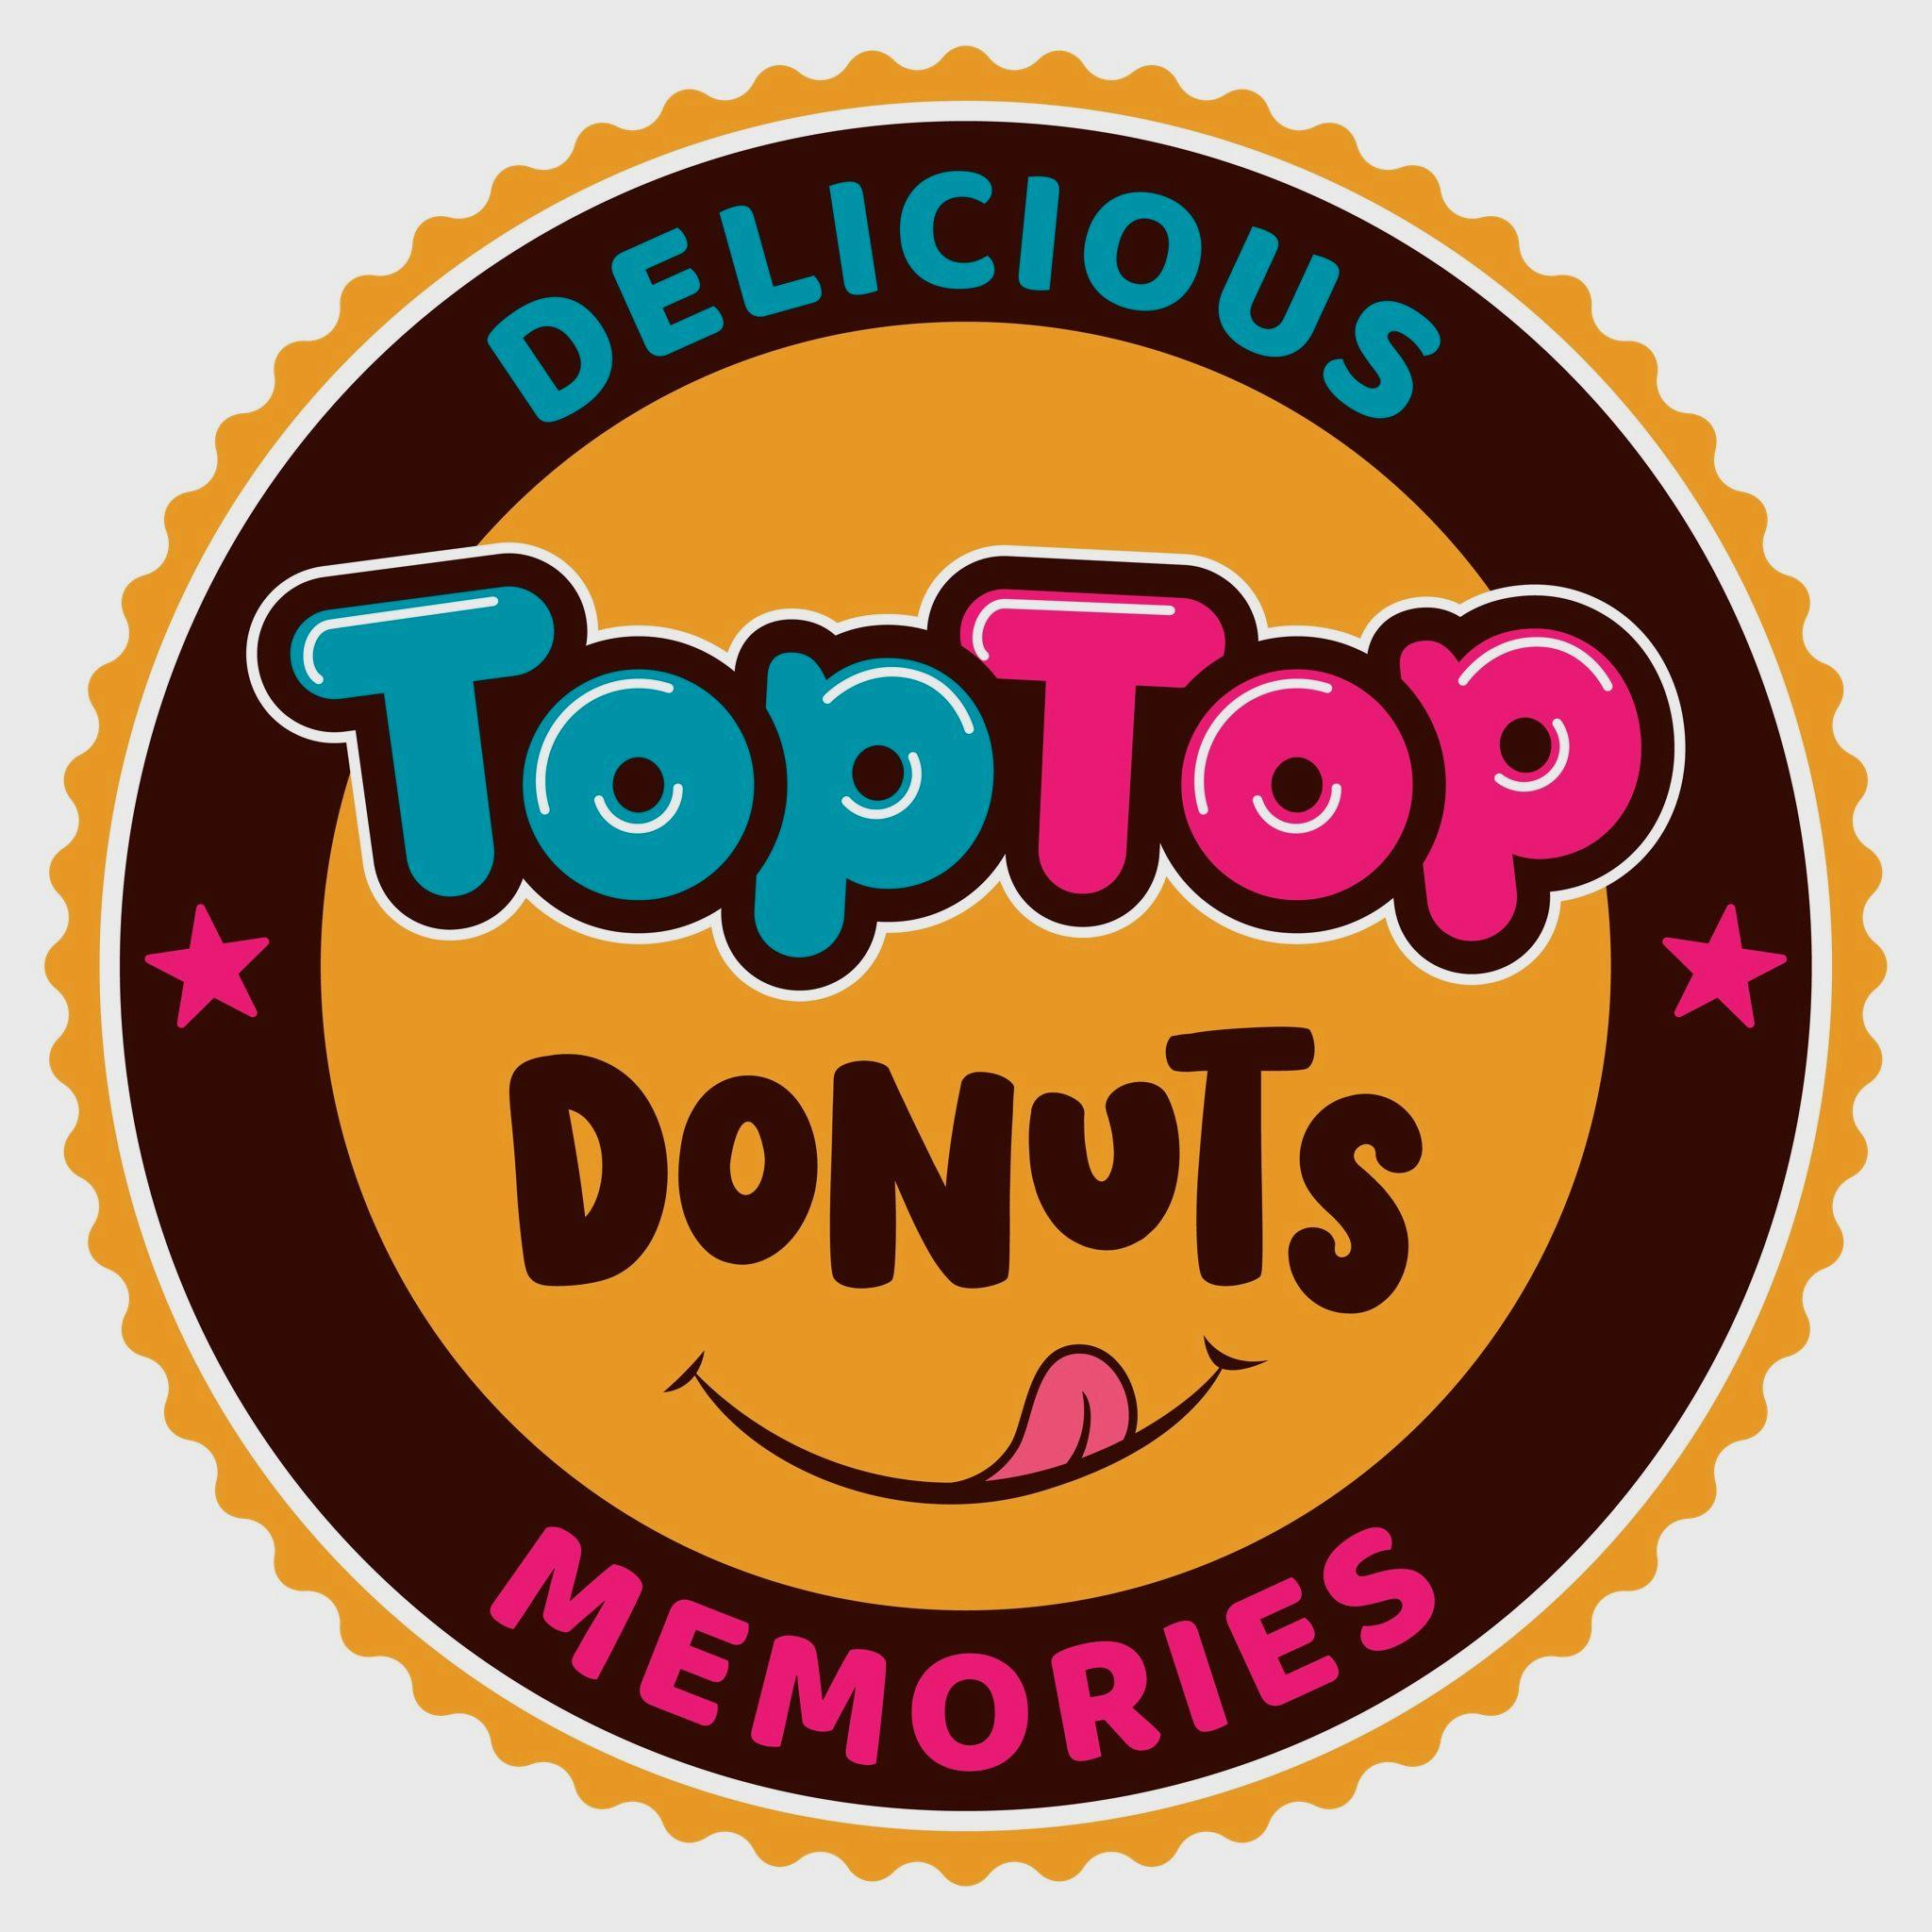 TopTop Donuts Viersen